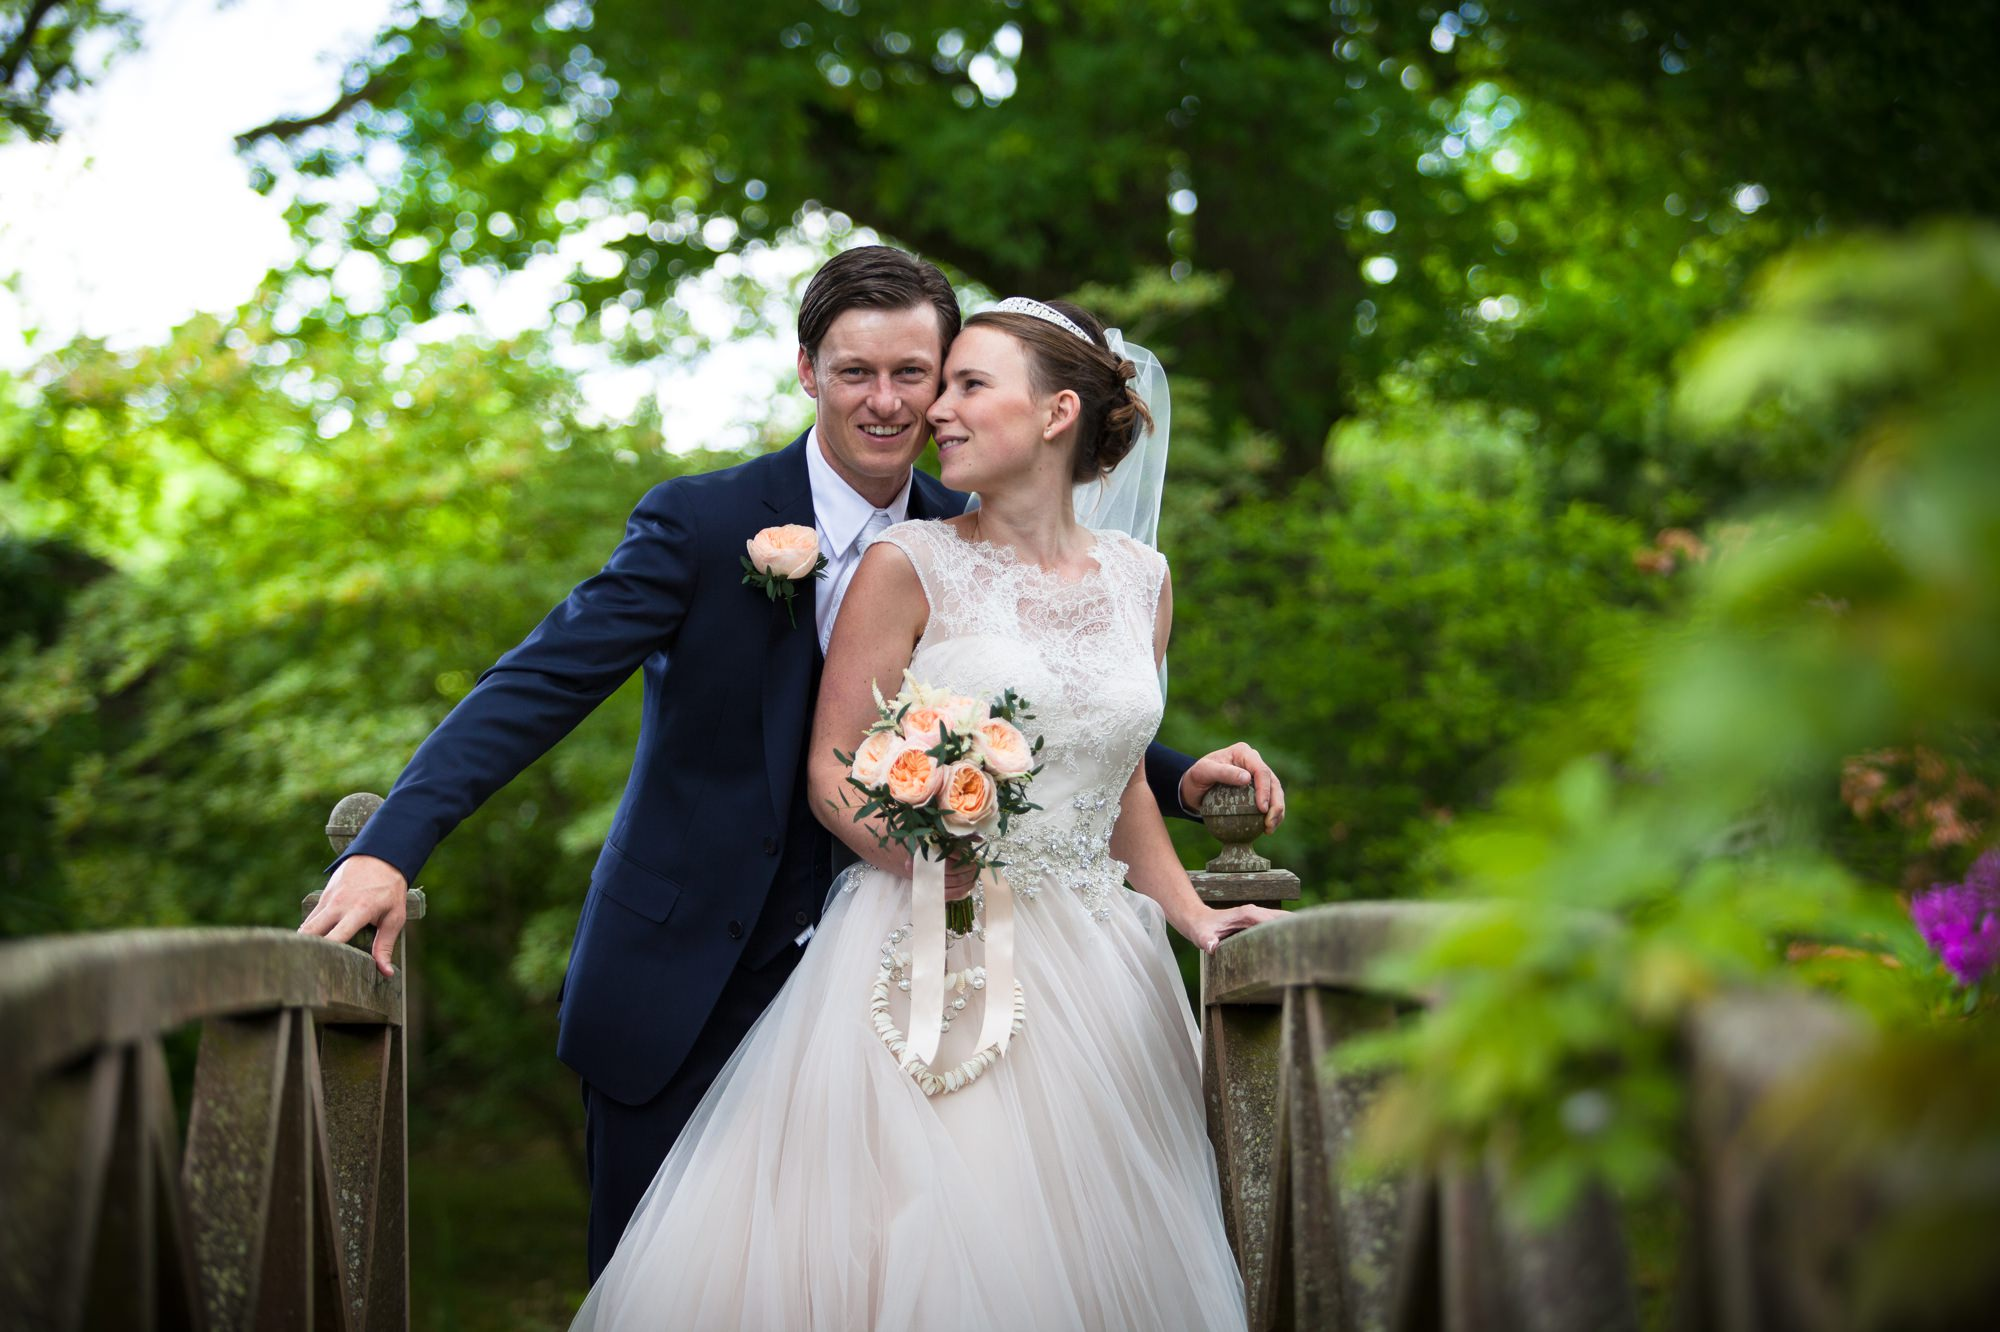 smallfield-place-wedding-6